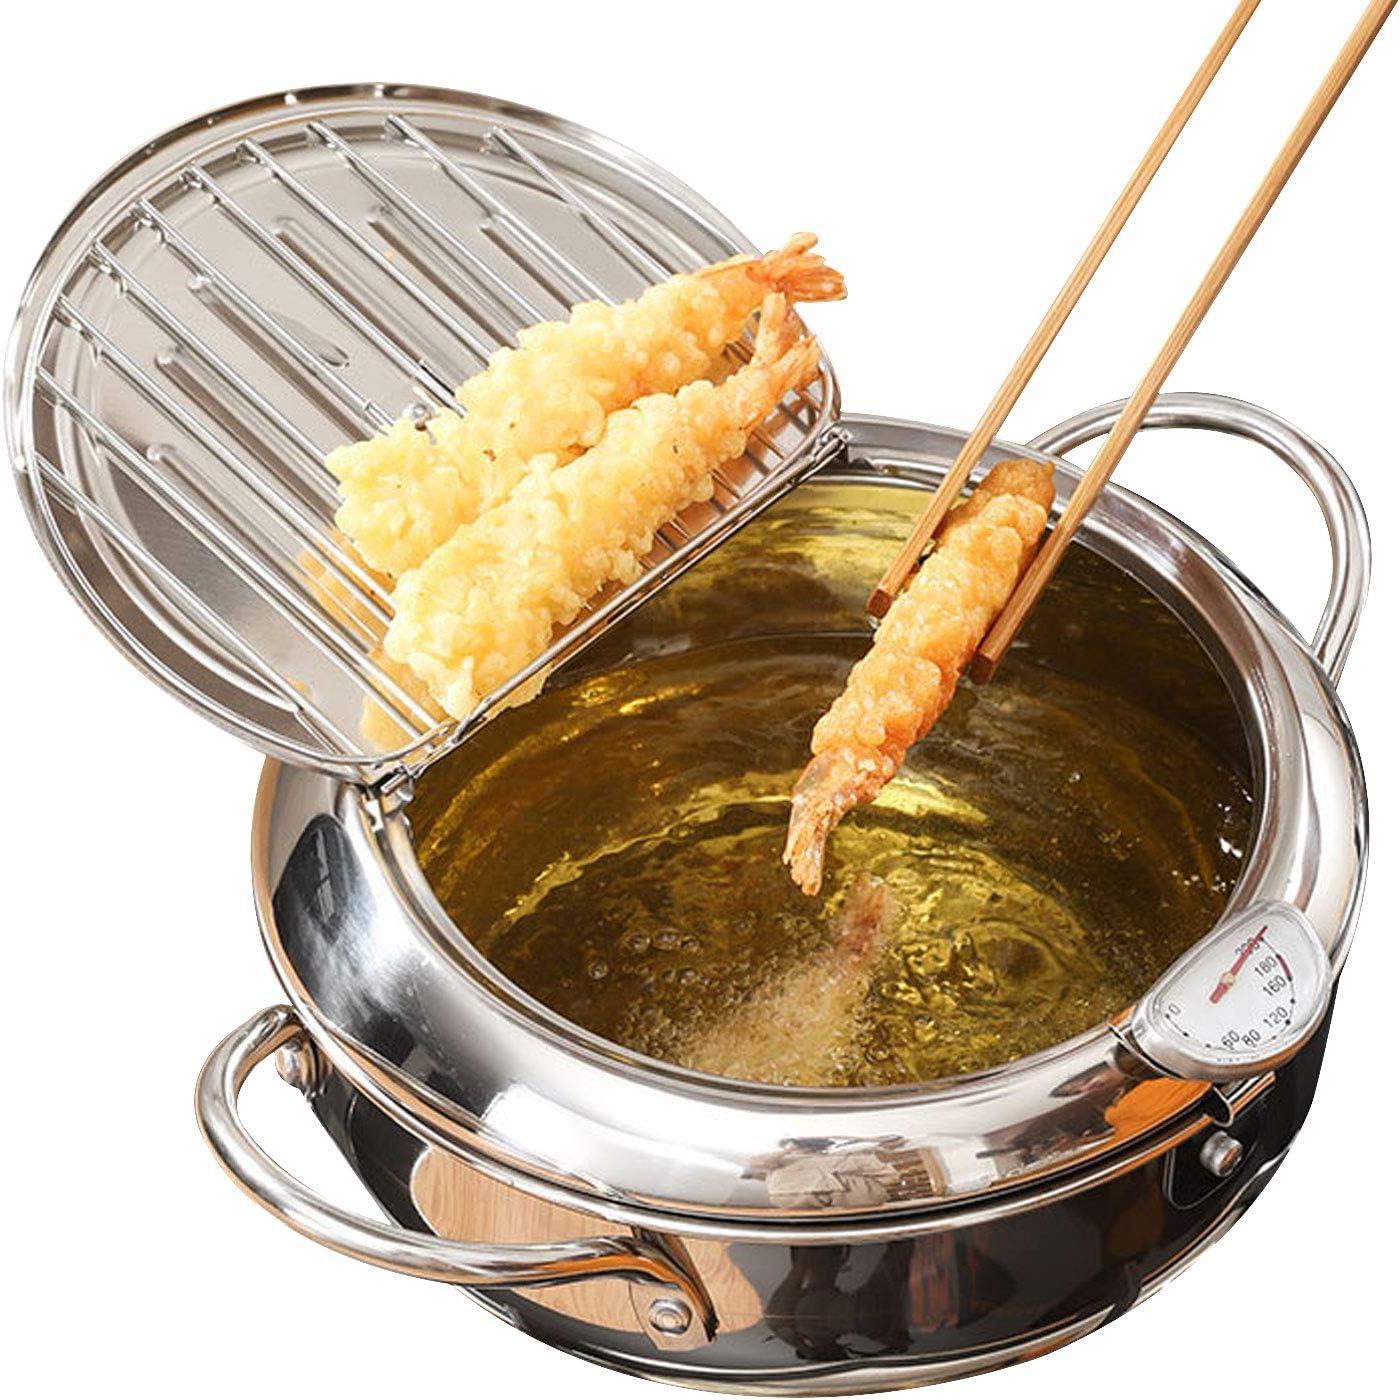 FONDDI Tempura Deep Fryer, Stainless Steel Deep Frying Pan, Temperature Control Chicken Pot Cooking Tool Kitchen Accessories